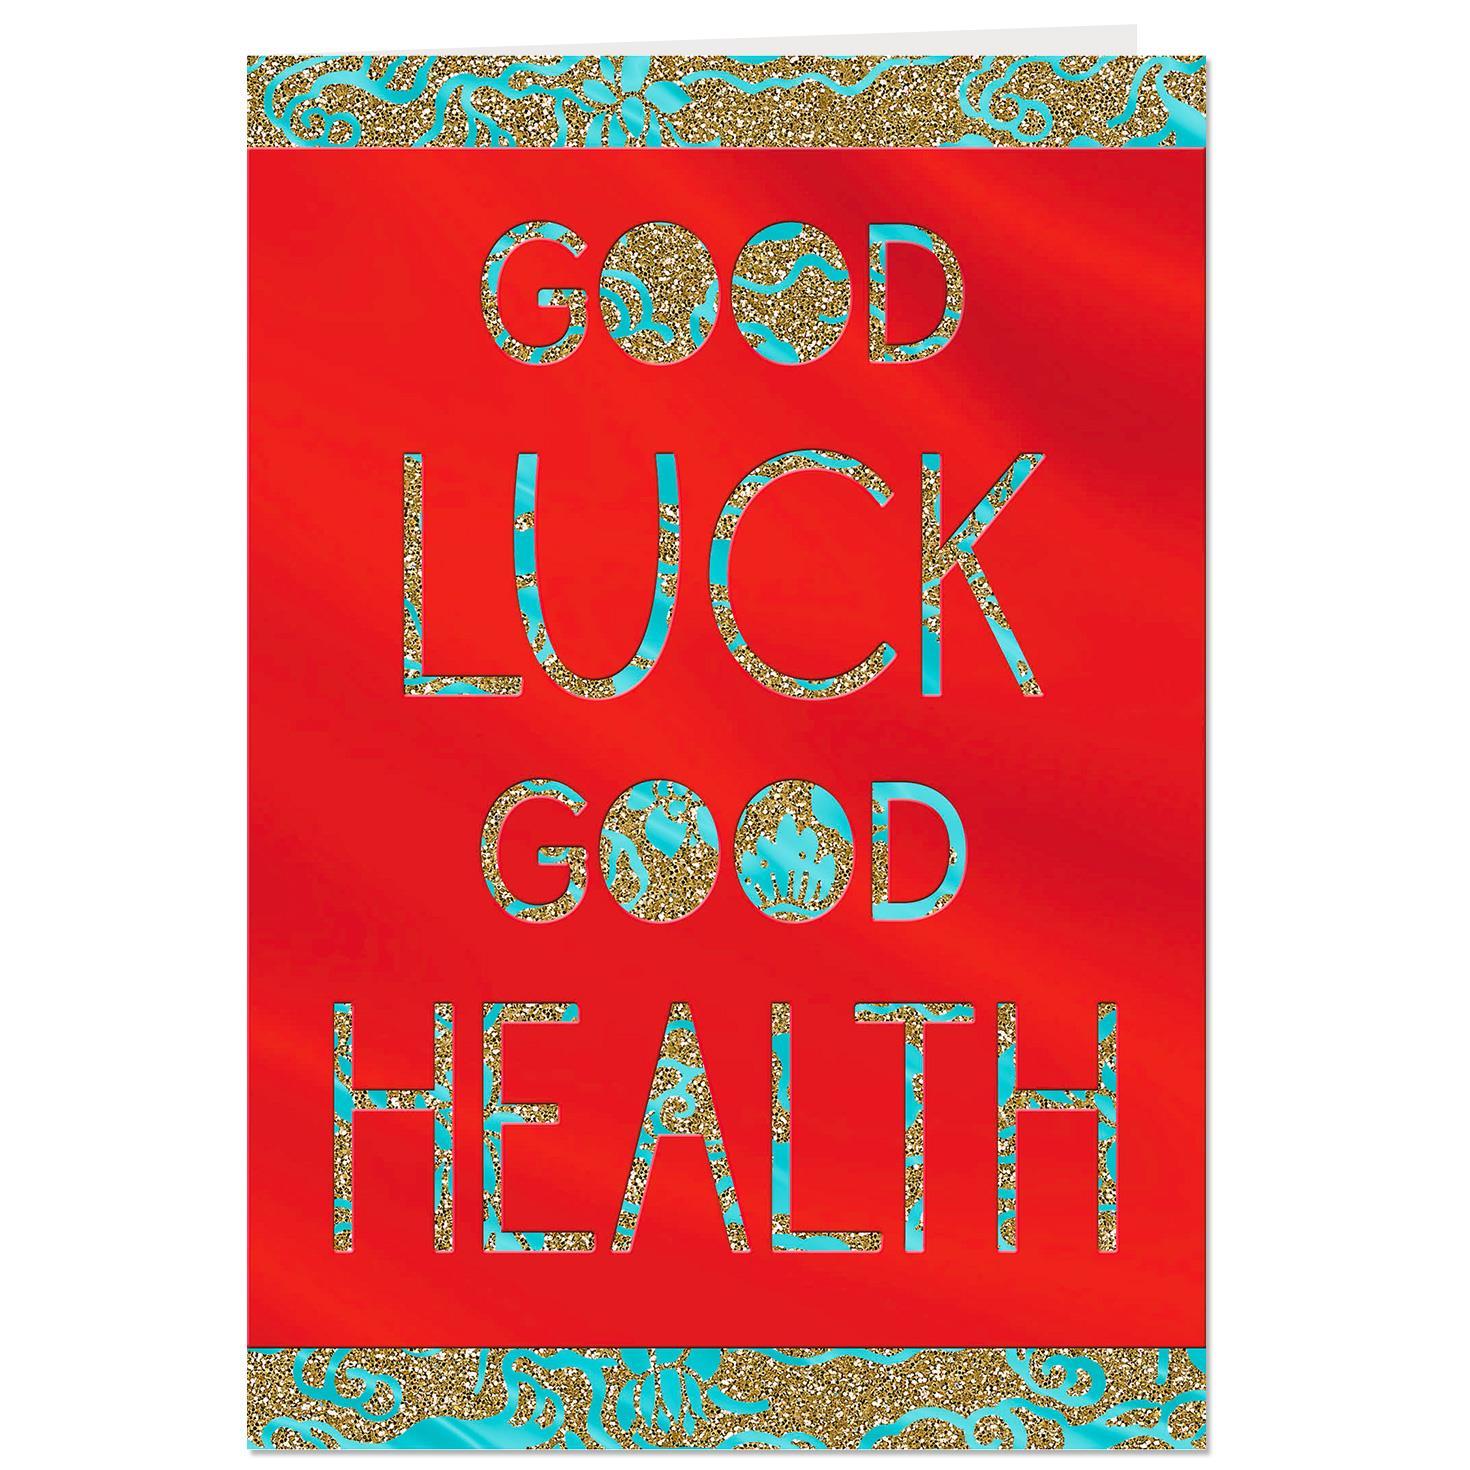 Good Luck Good Health Lunar New Year Card Greeting